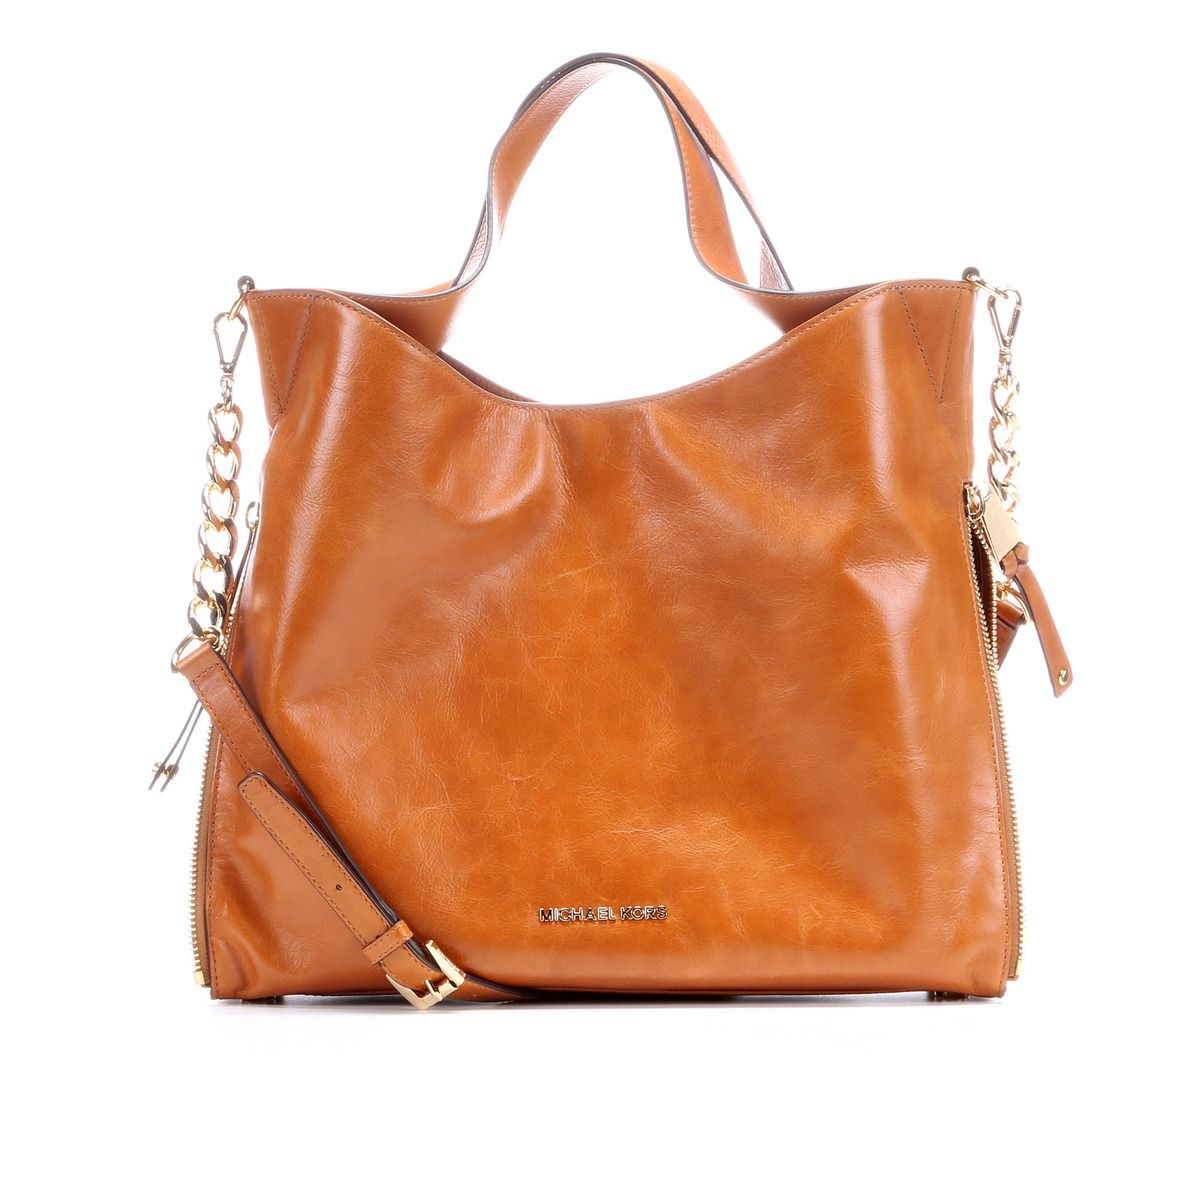 7908c98b0665 MICHAEL Michael Kors Devon Large Shoulder Tote Bag - Light Luggage ...